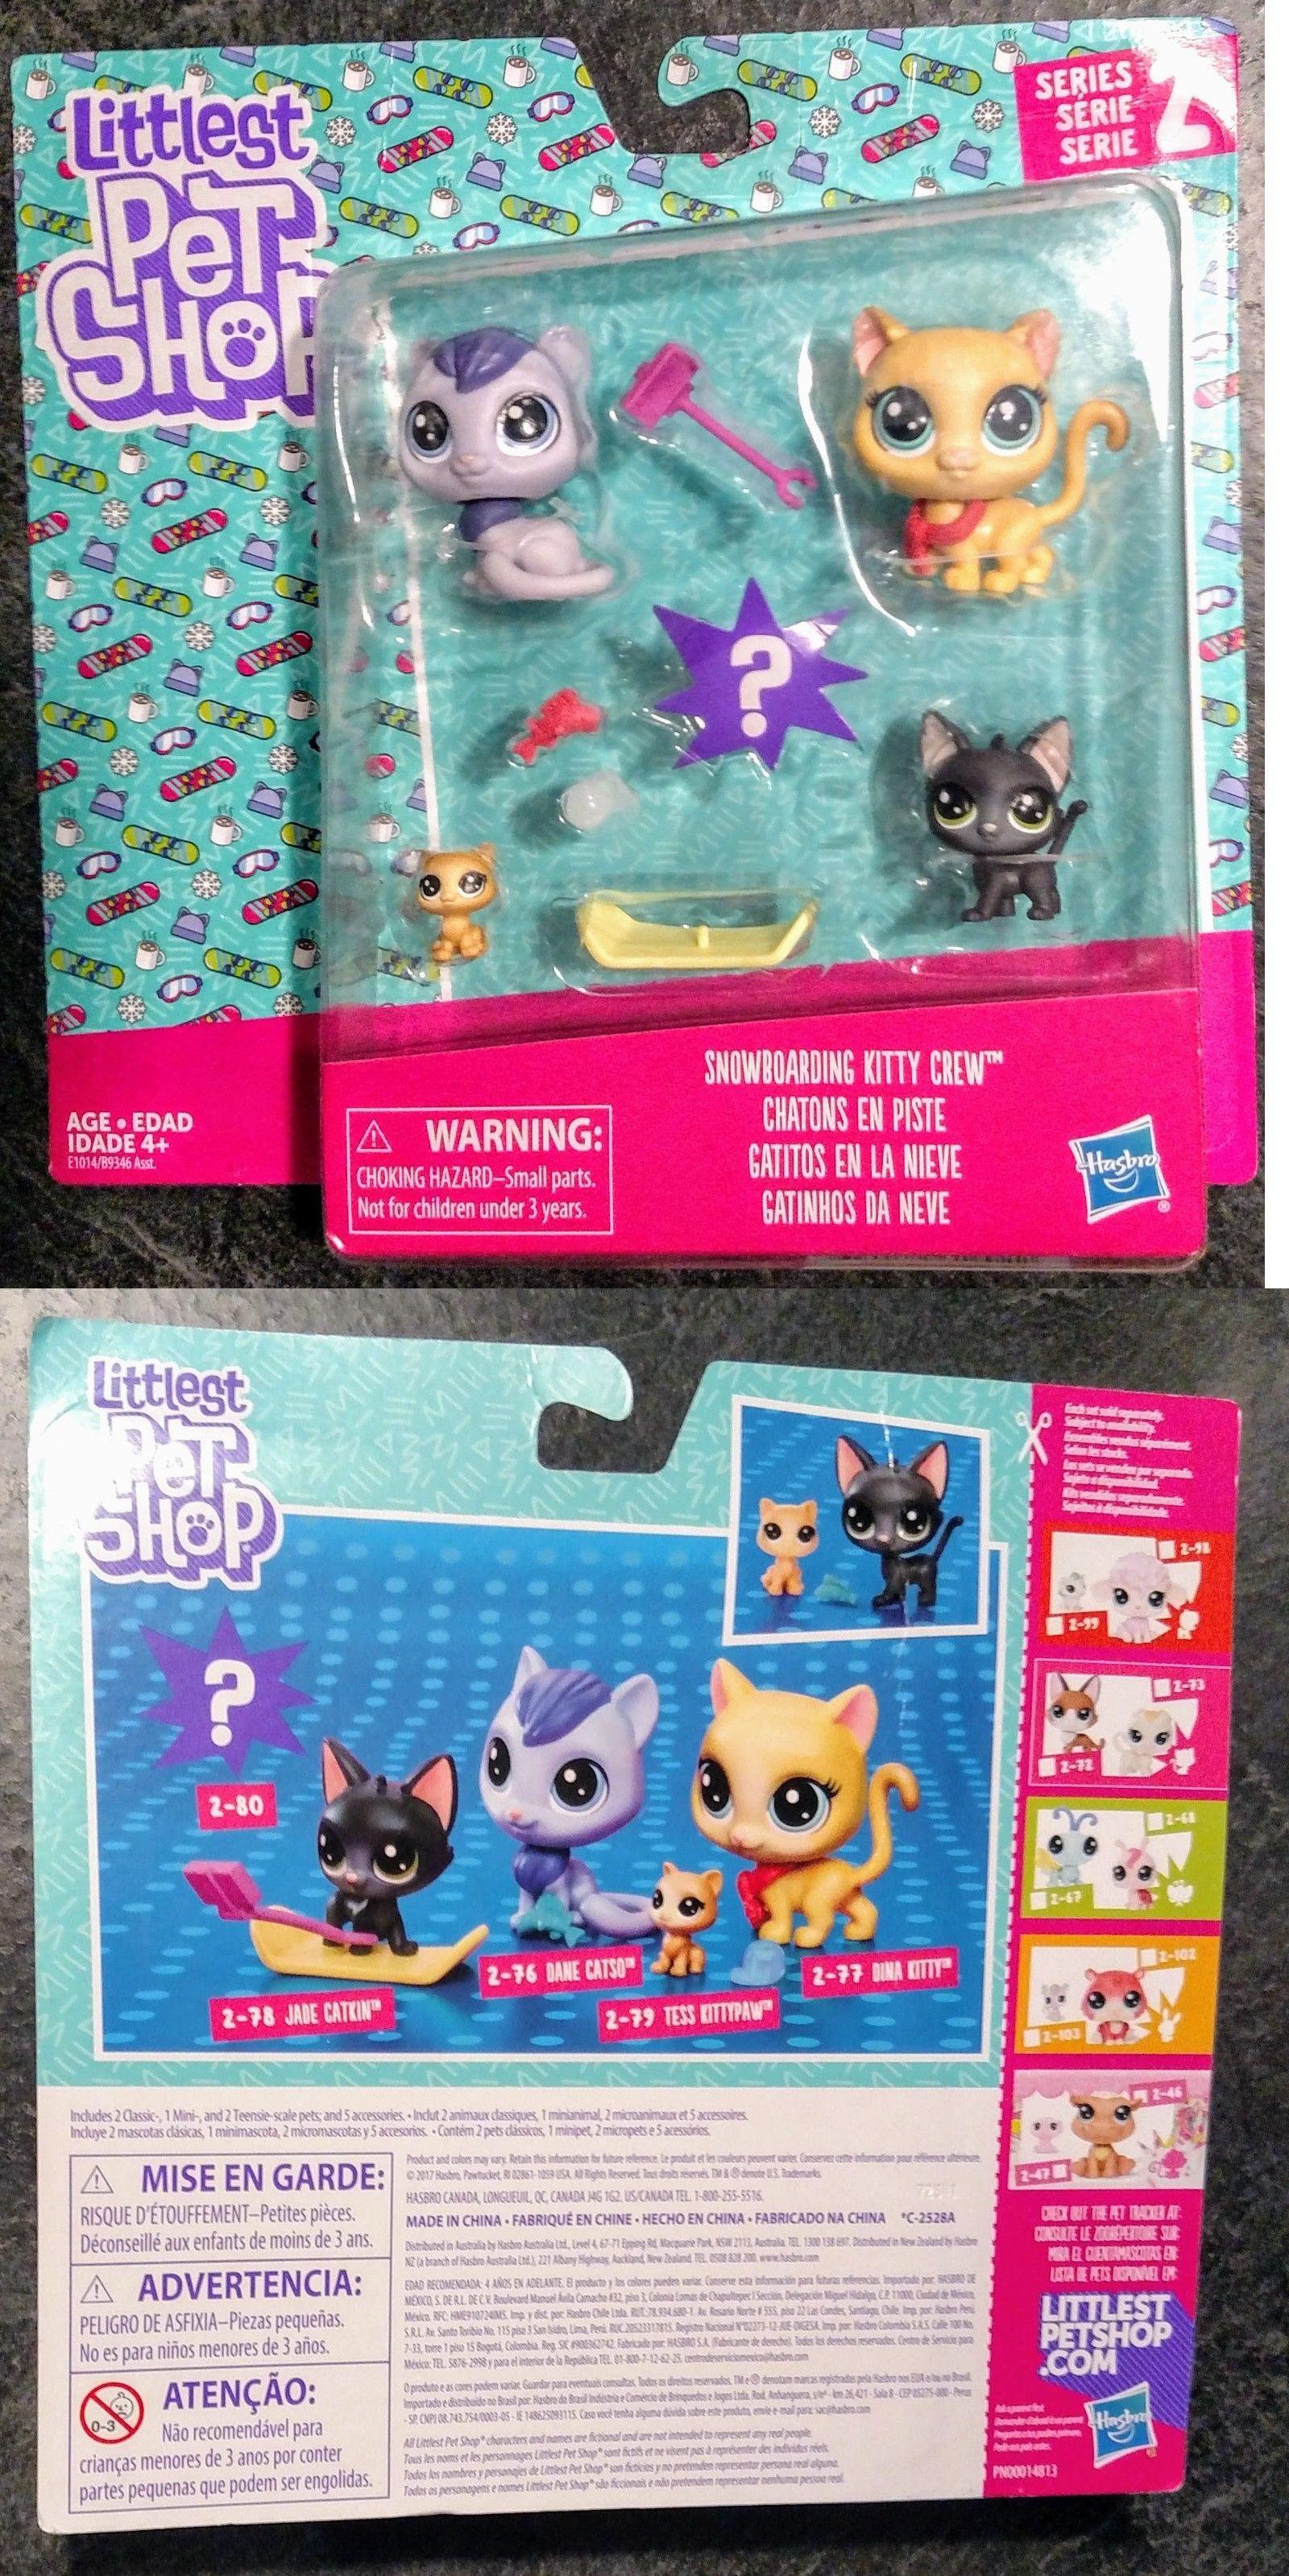 5 Kitties 2018 Snowboarding Kitty Cat Crew Littlest Pet Shop Family Lps Little Pet Shop Lps Toys Lps Littlest Pet Shop